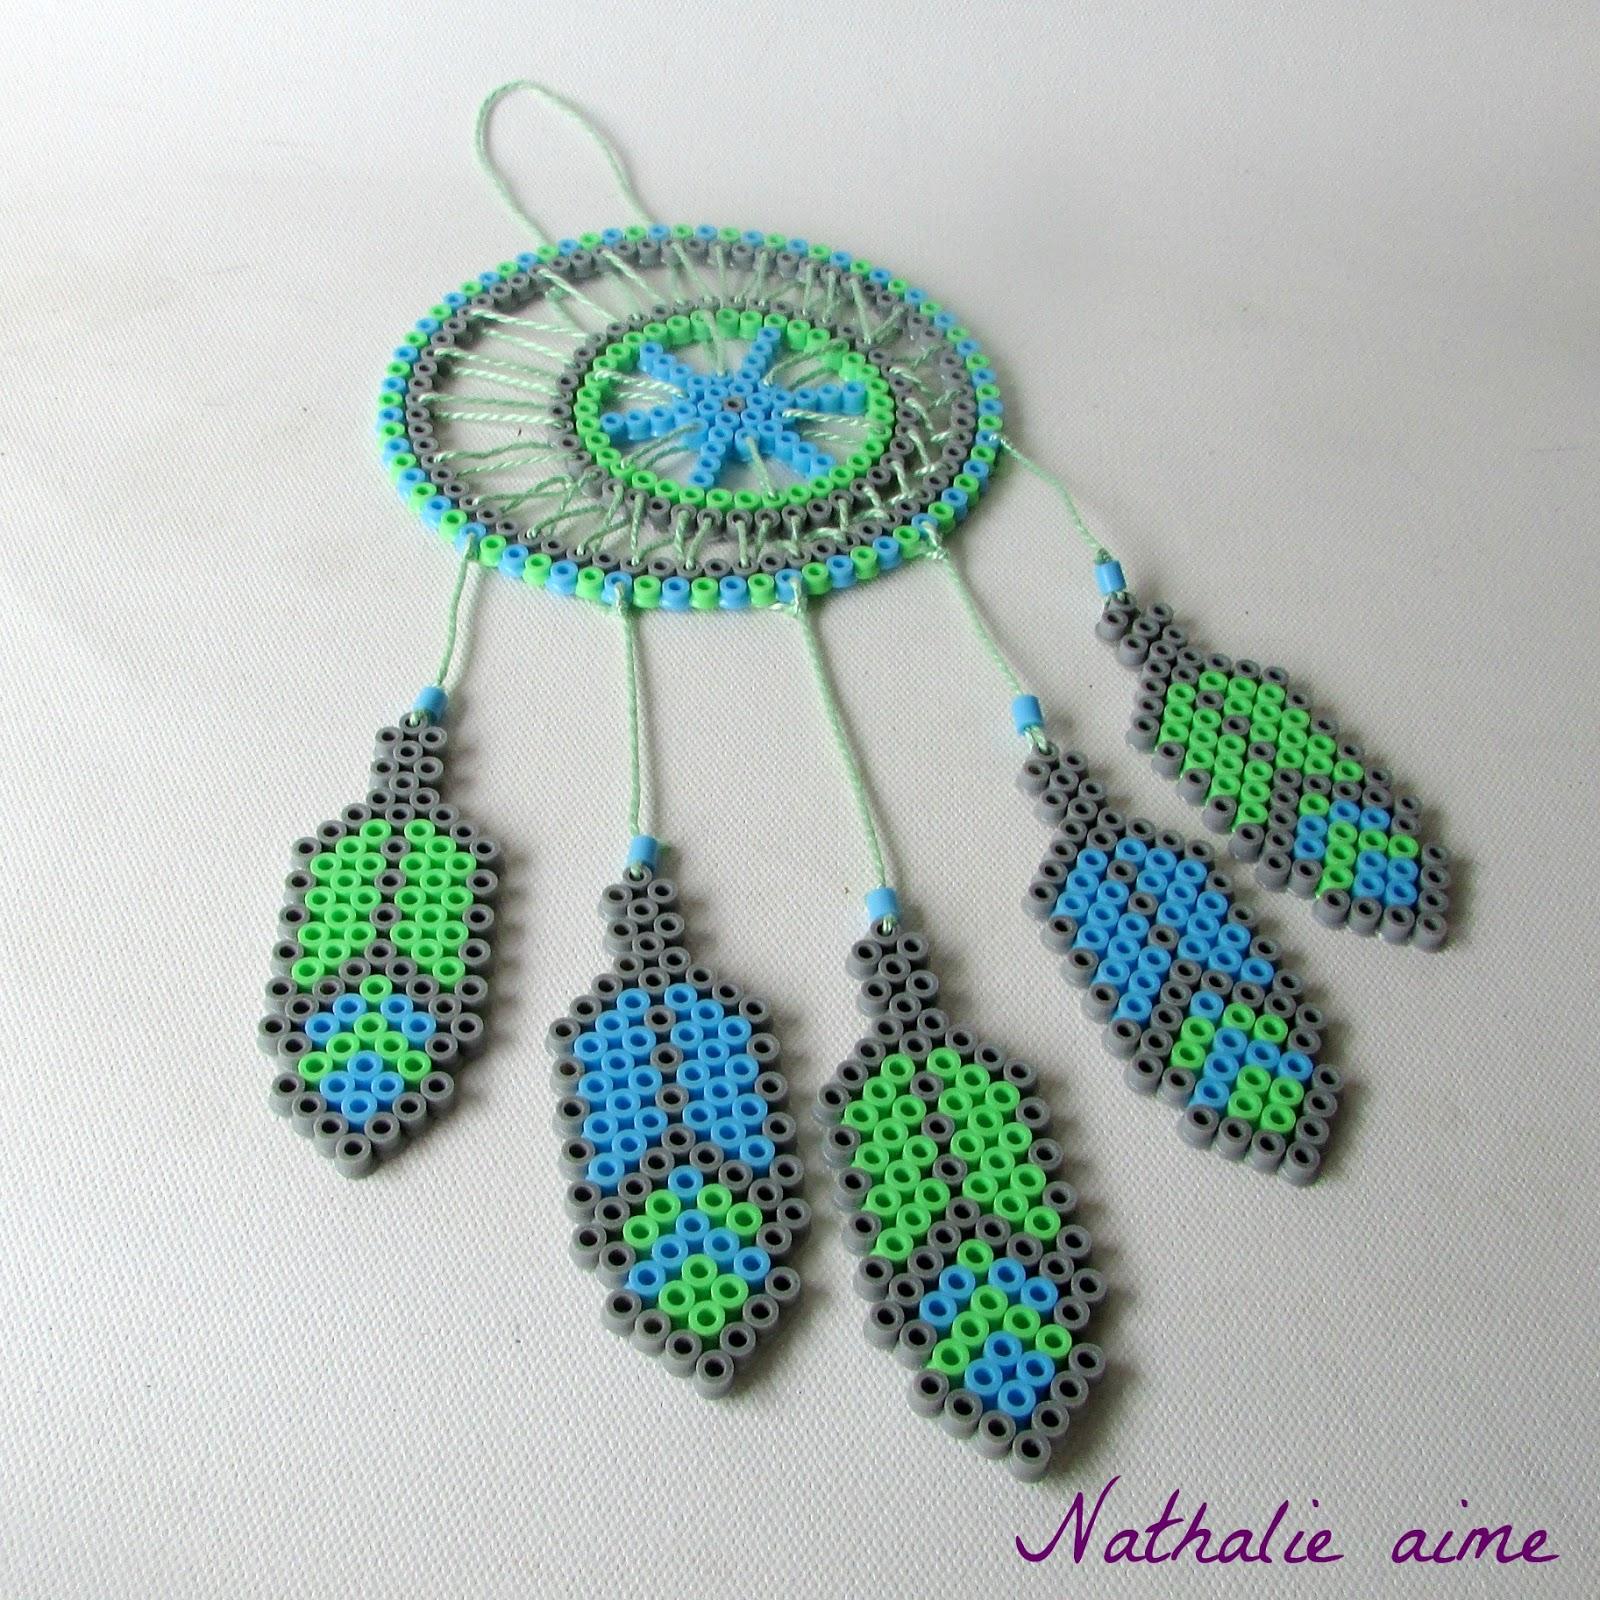 Idee perle a repasser fashion designs - Perle a repasser modele ...